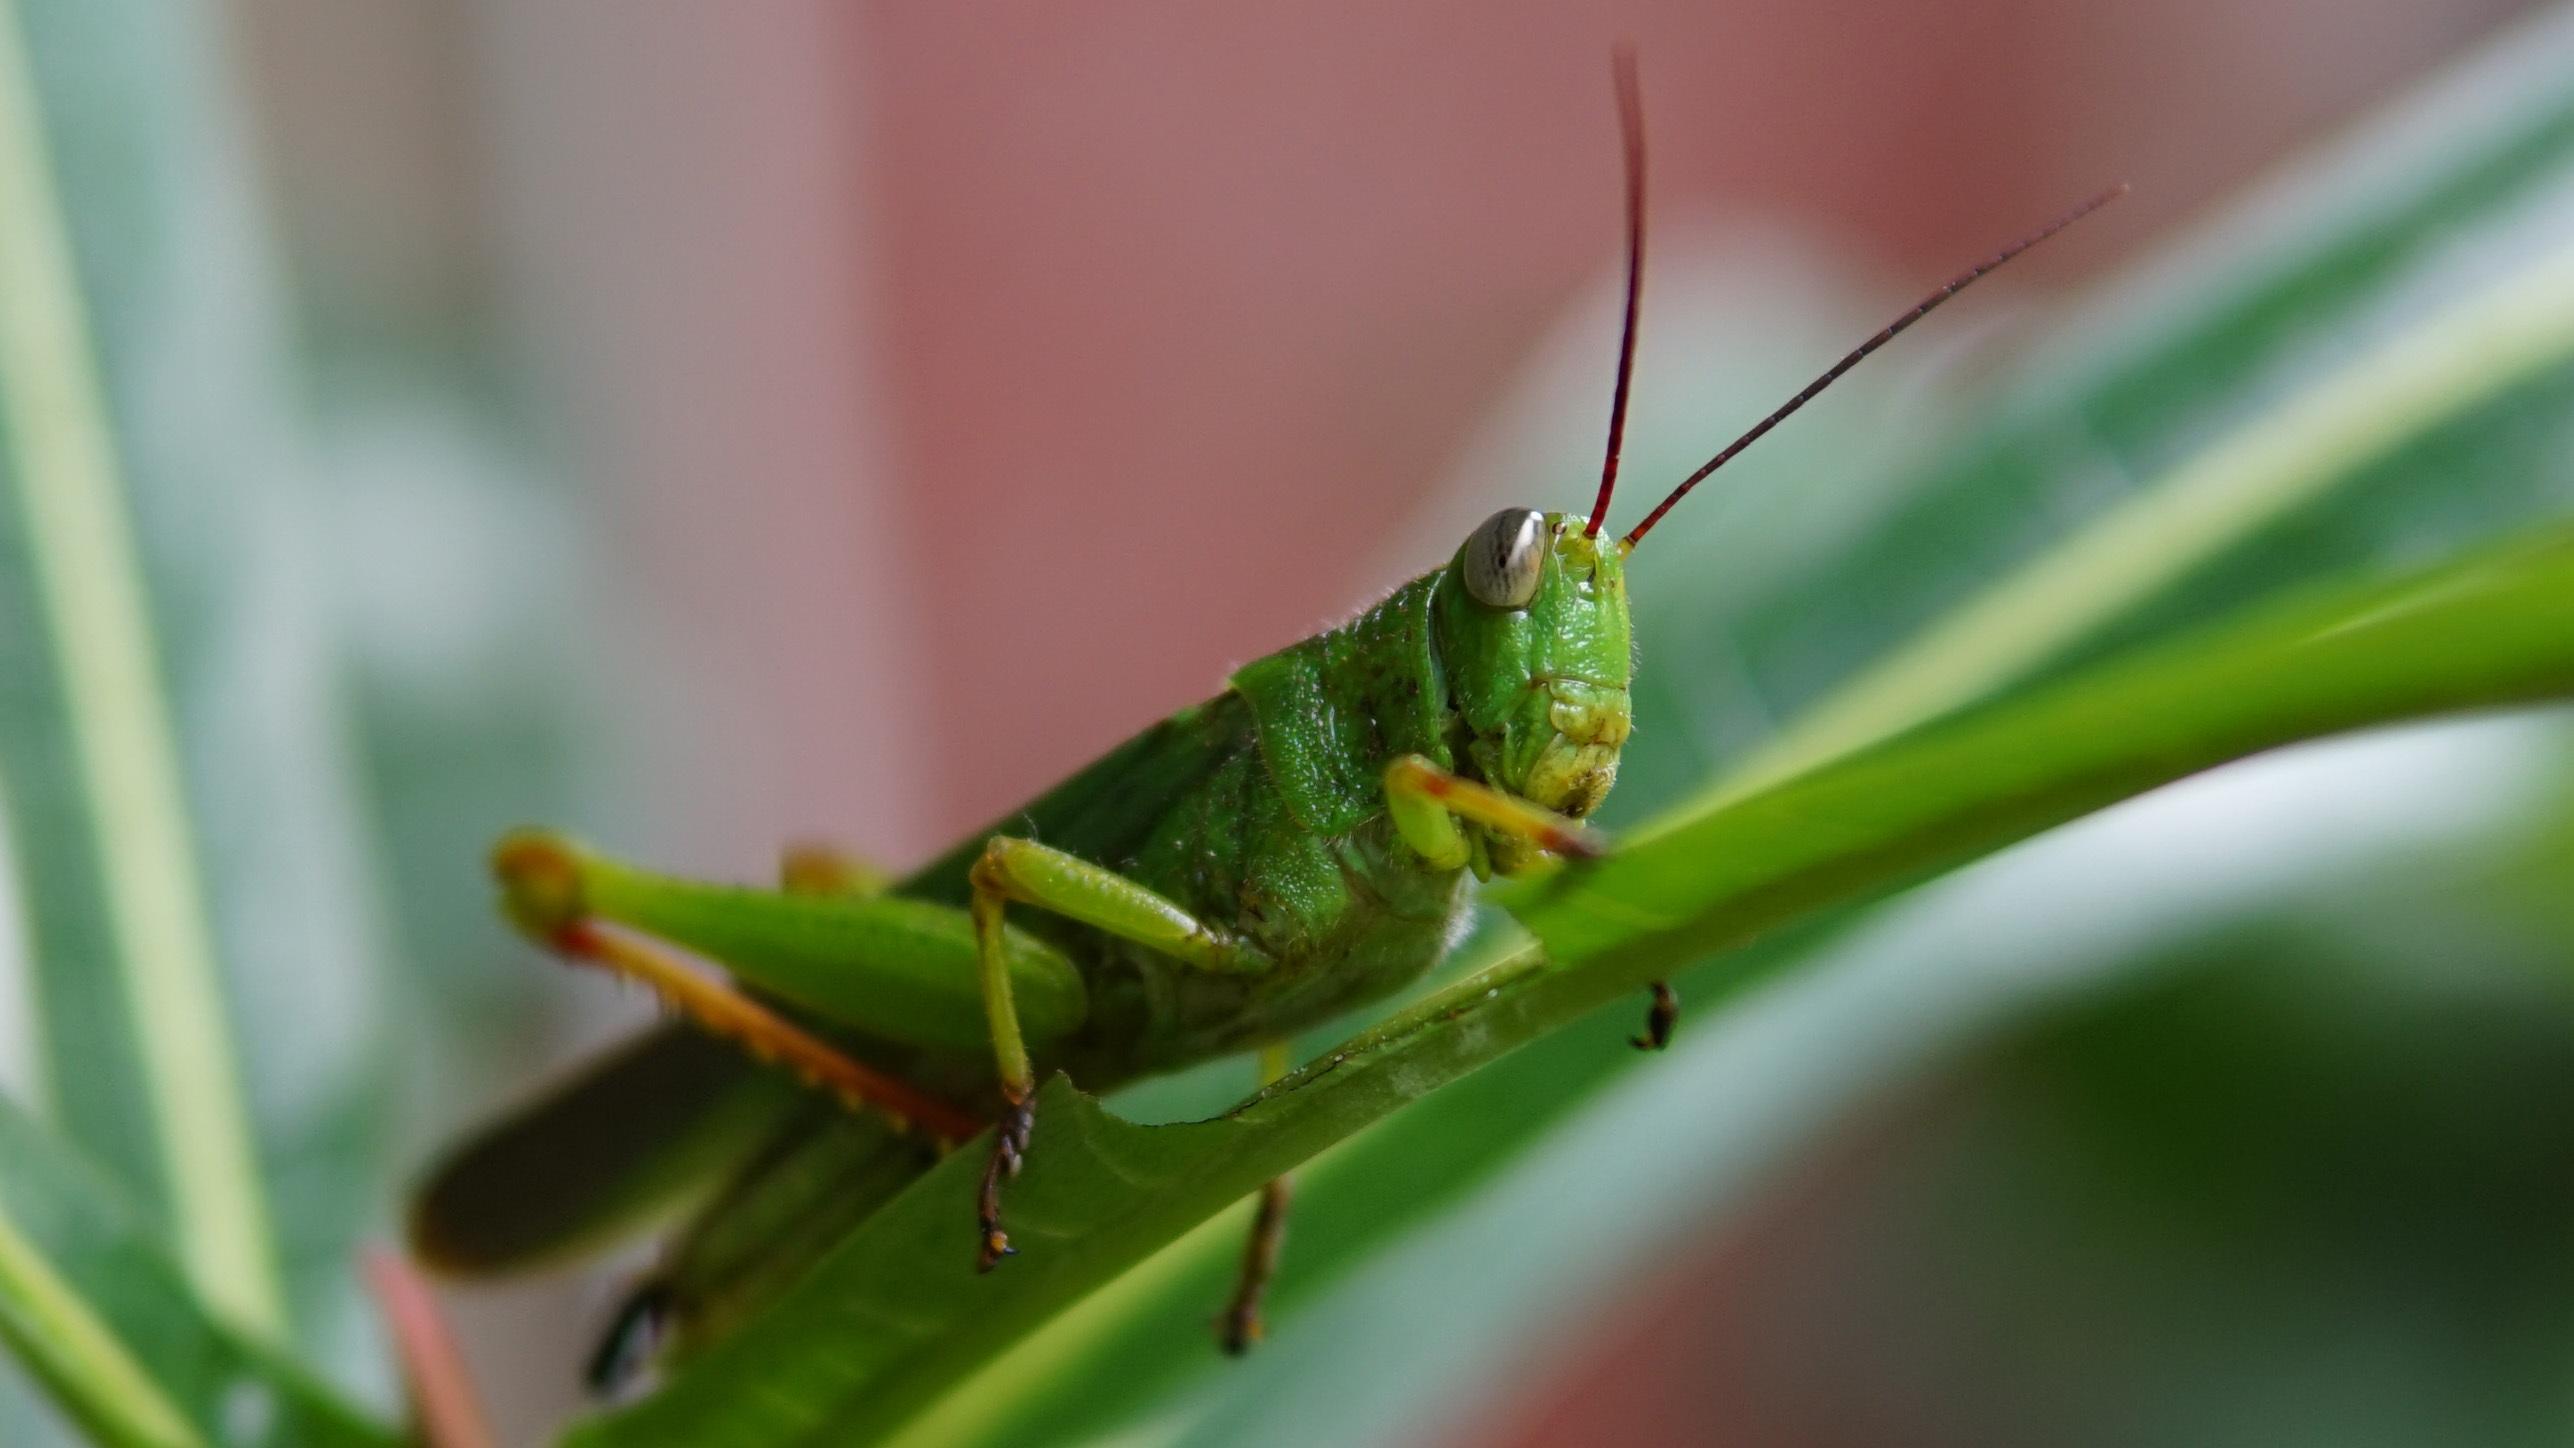 Free Images : nature, grass, leaf, flower, animal, summer ...